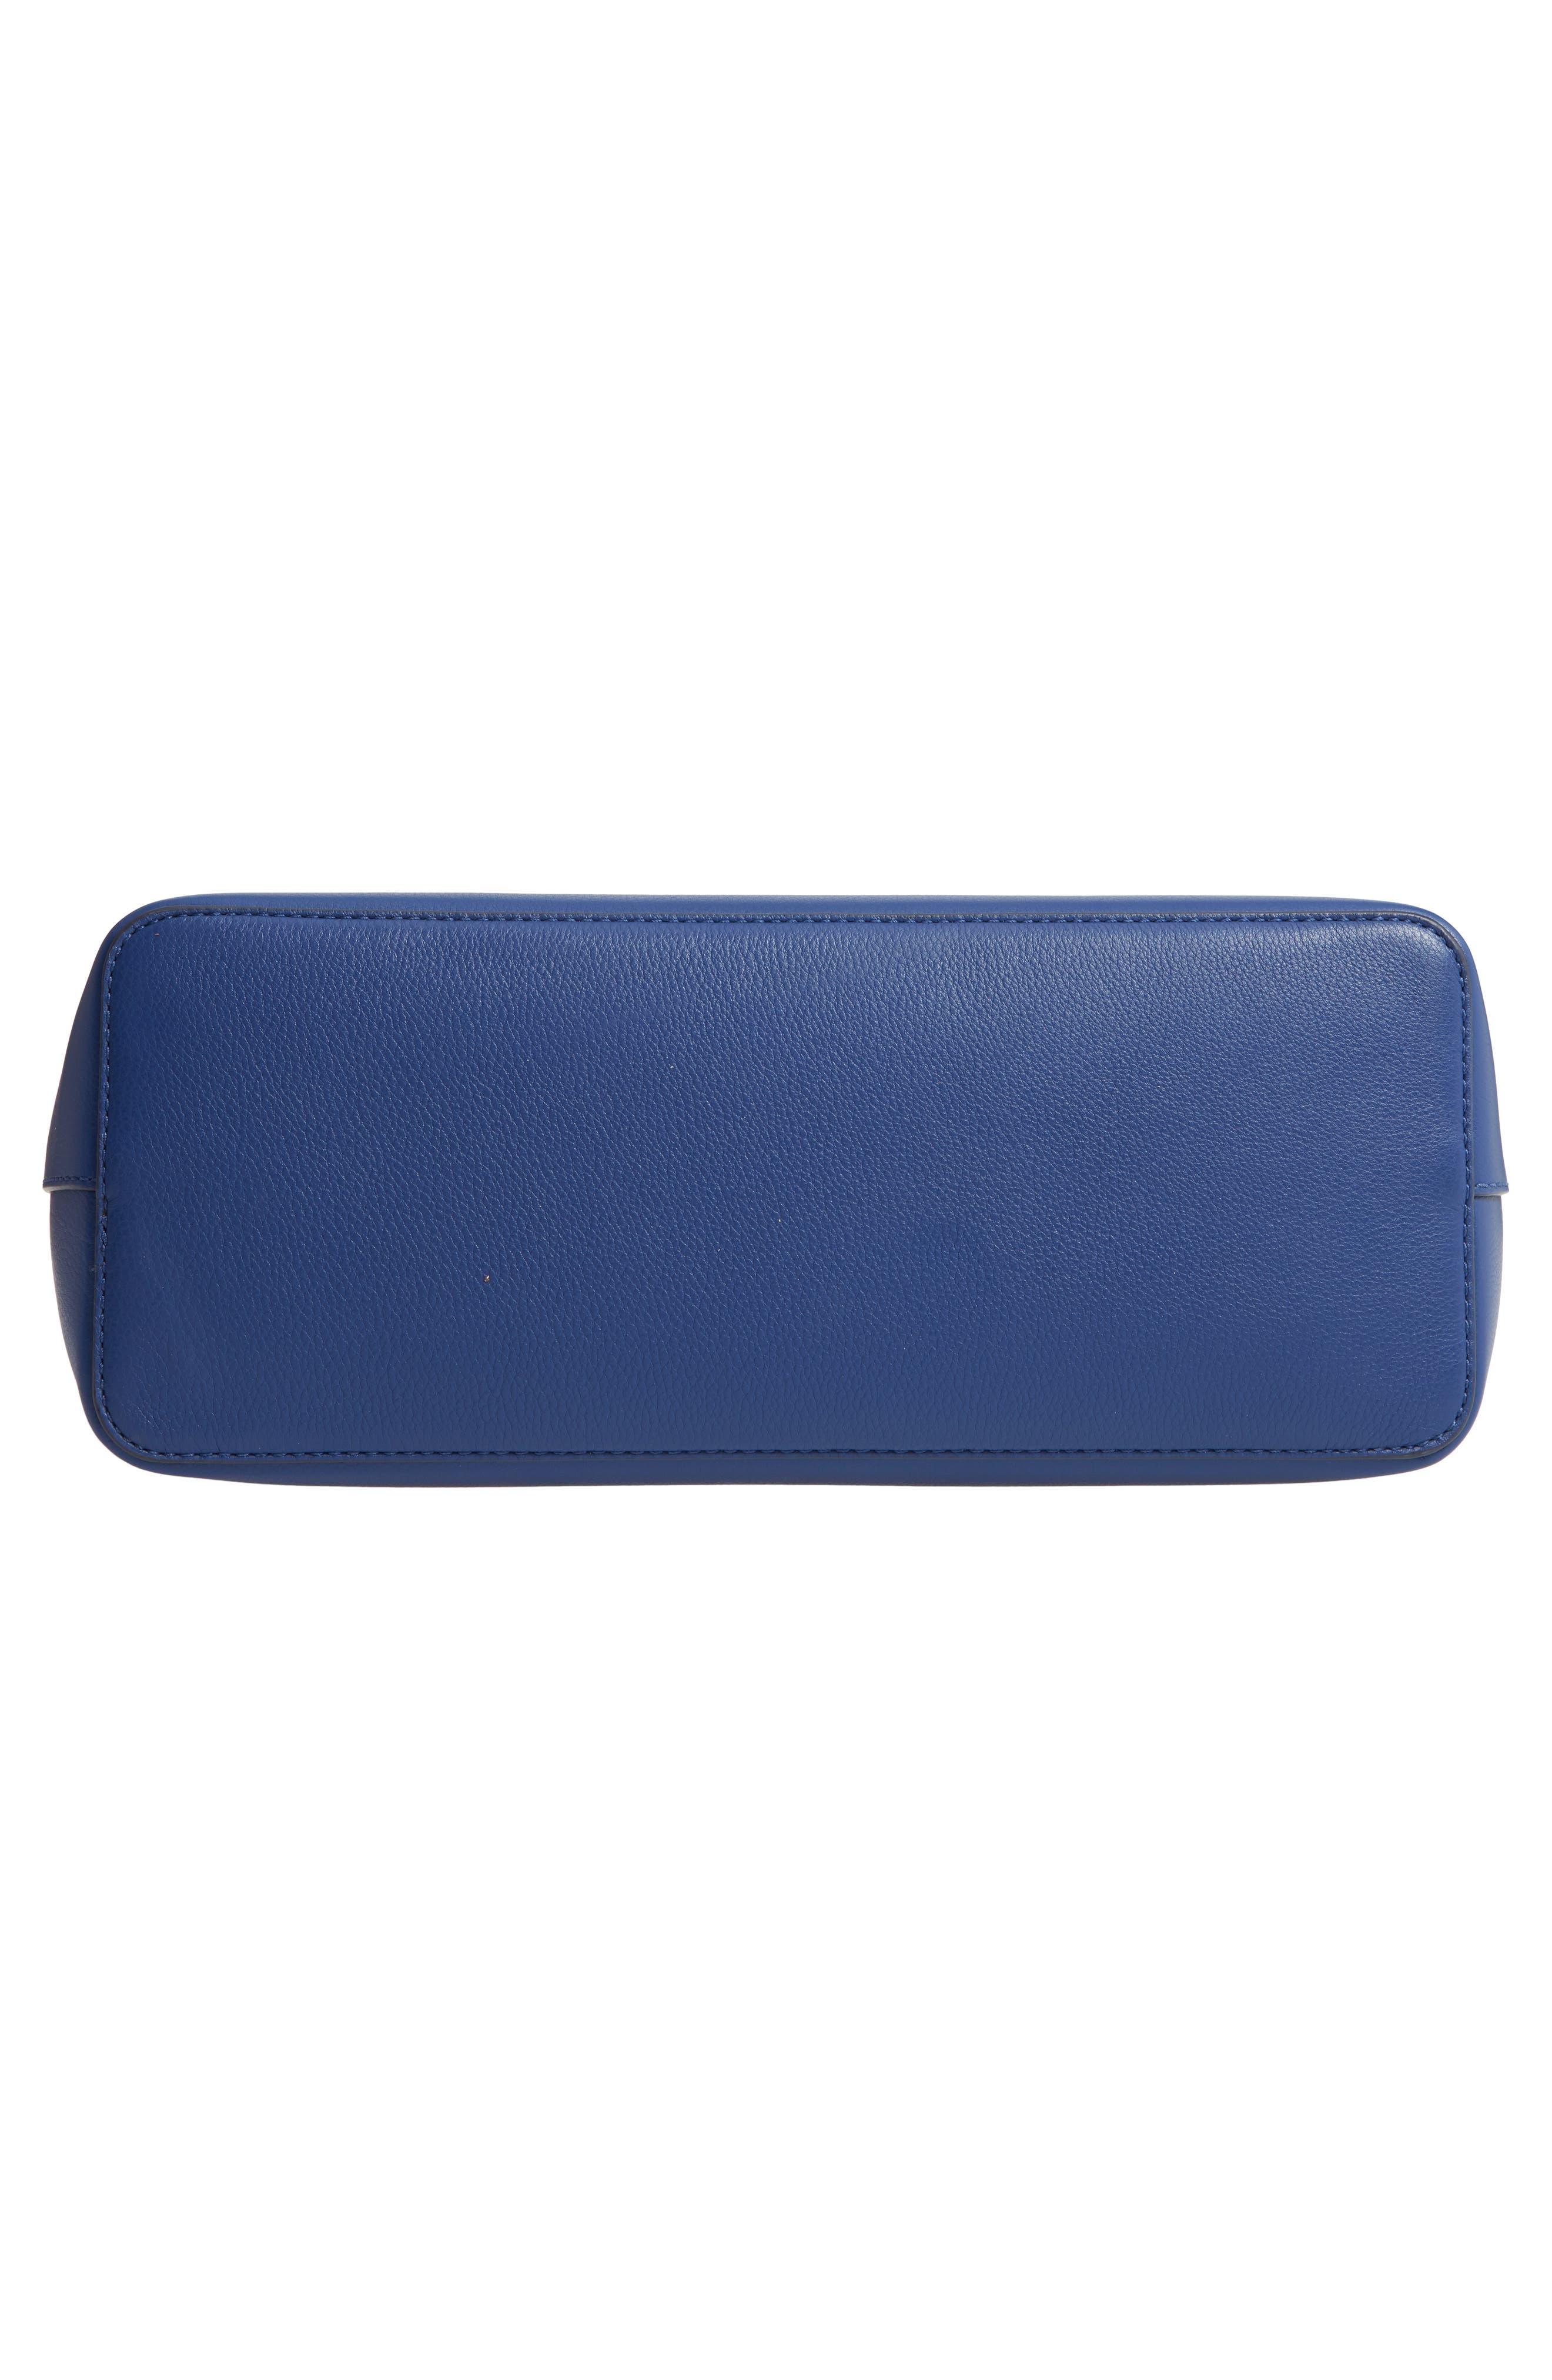 McGraw Leather Laptop Tote,                             Alternate thumbnail 4, color,                             Bright Indigo